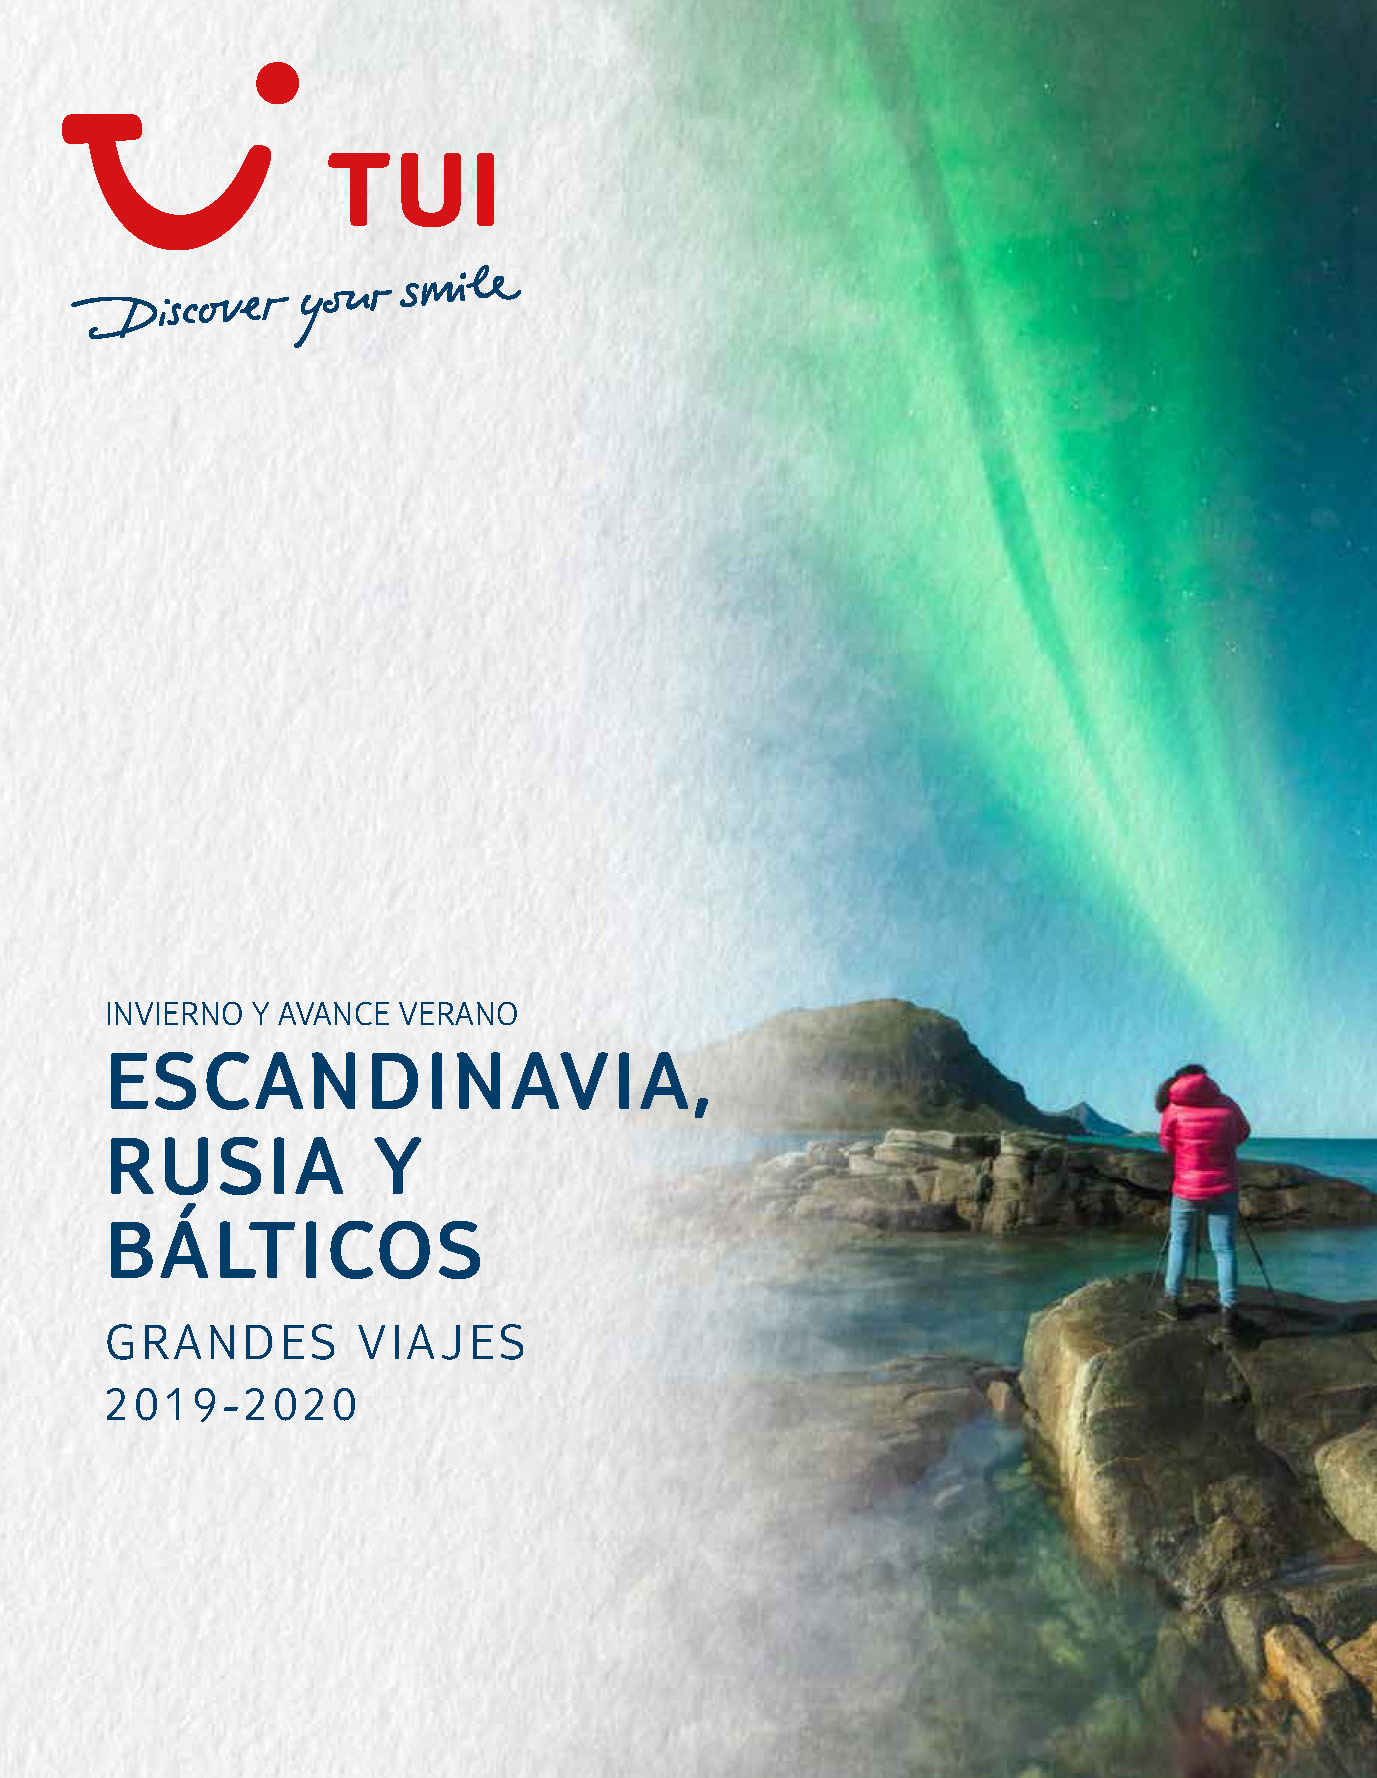 Catalogo TUI Ambassador Tours Escandinavia Rusia y Balticos 2019-2020